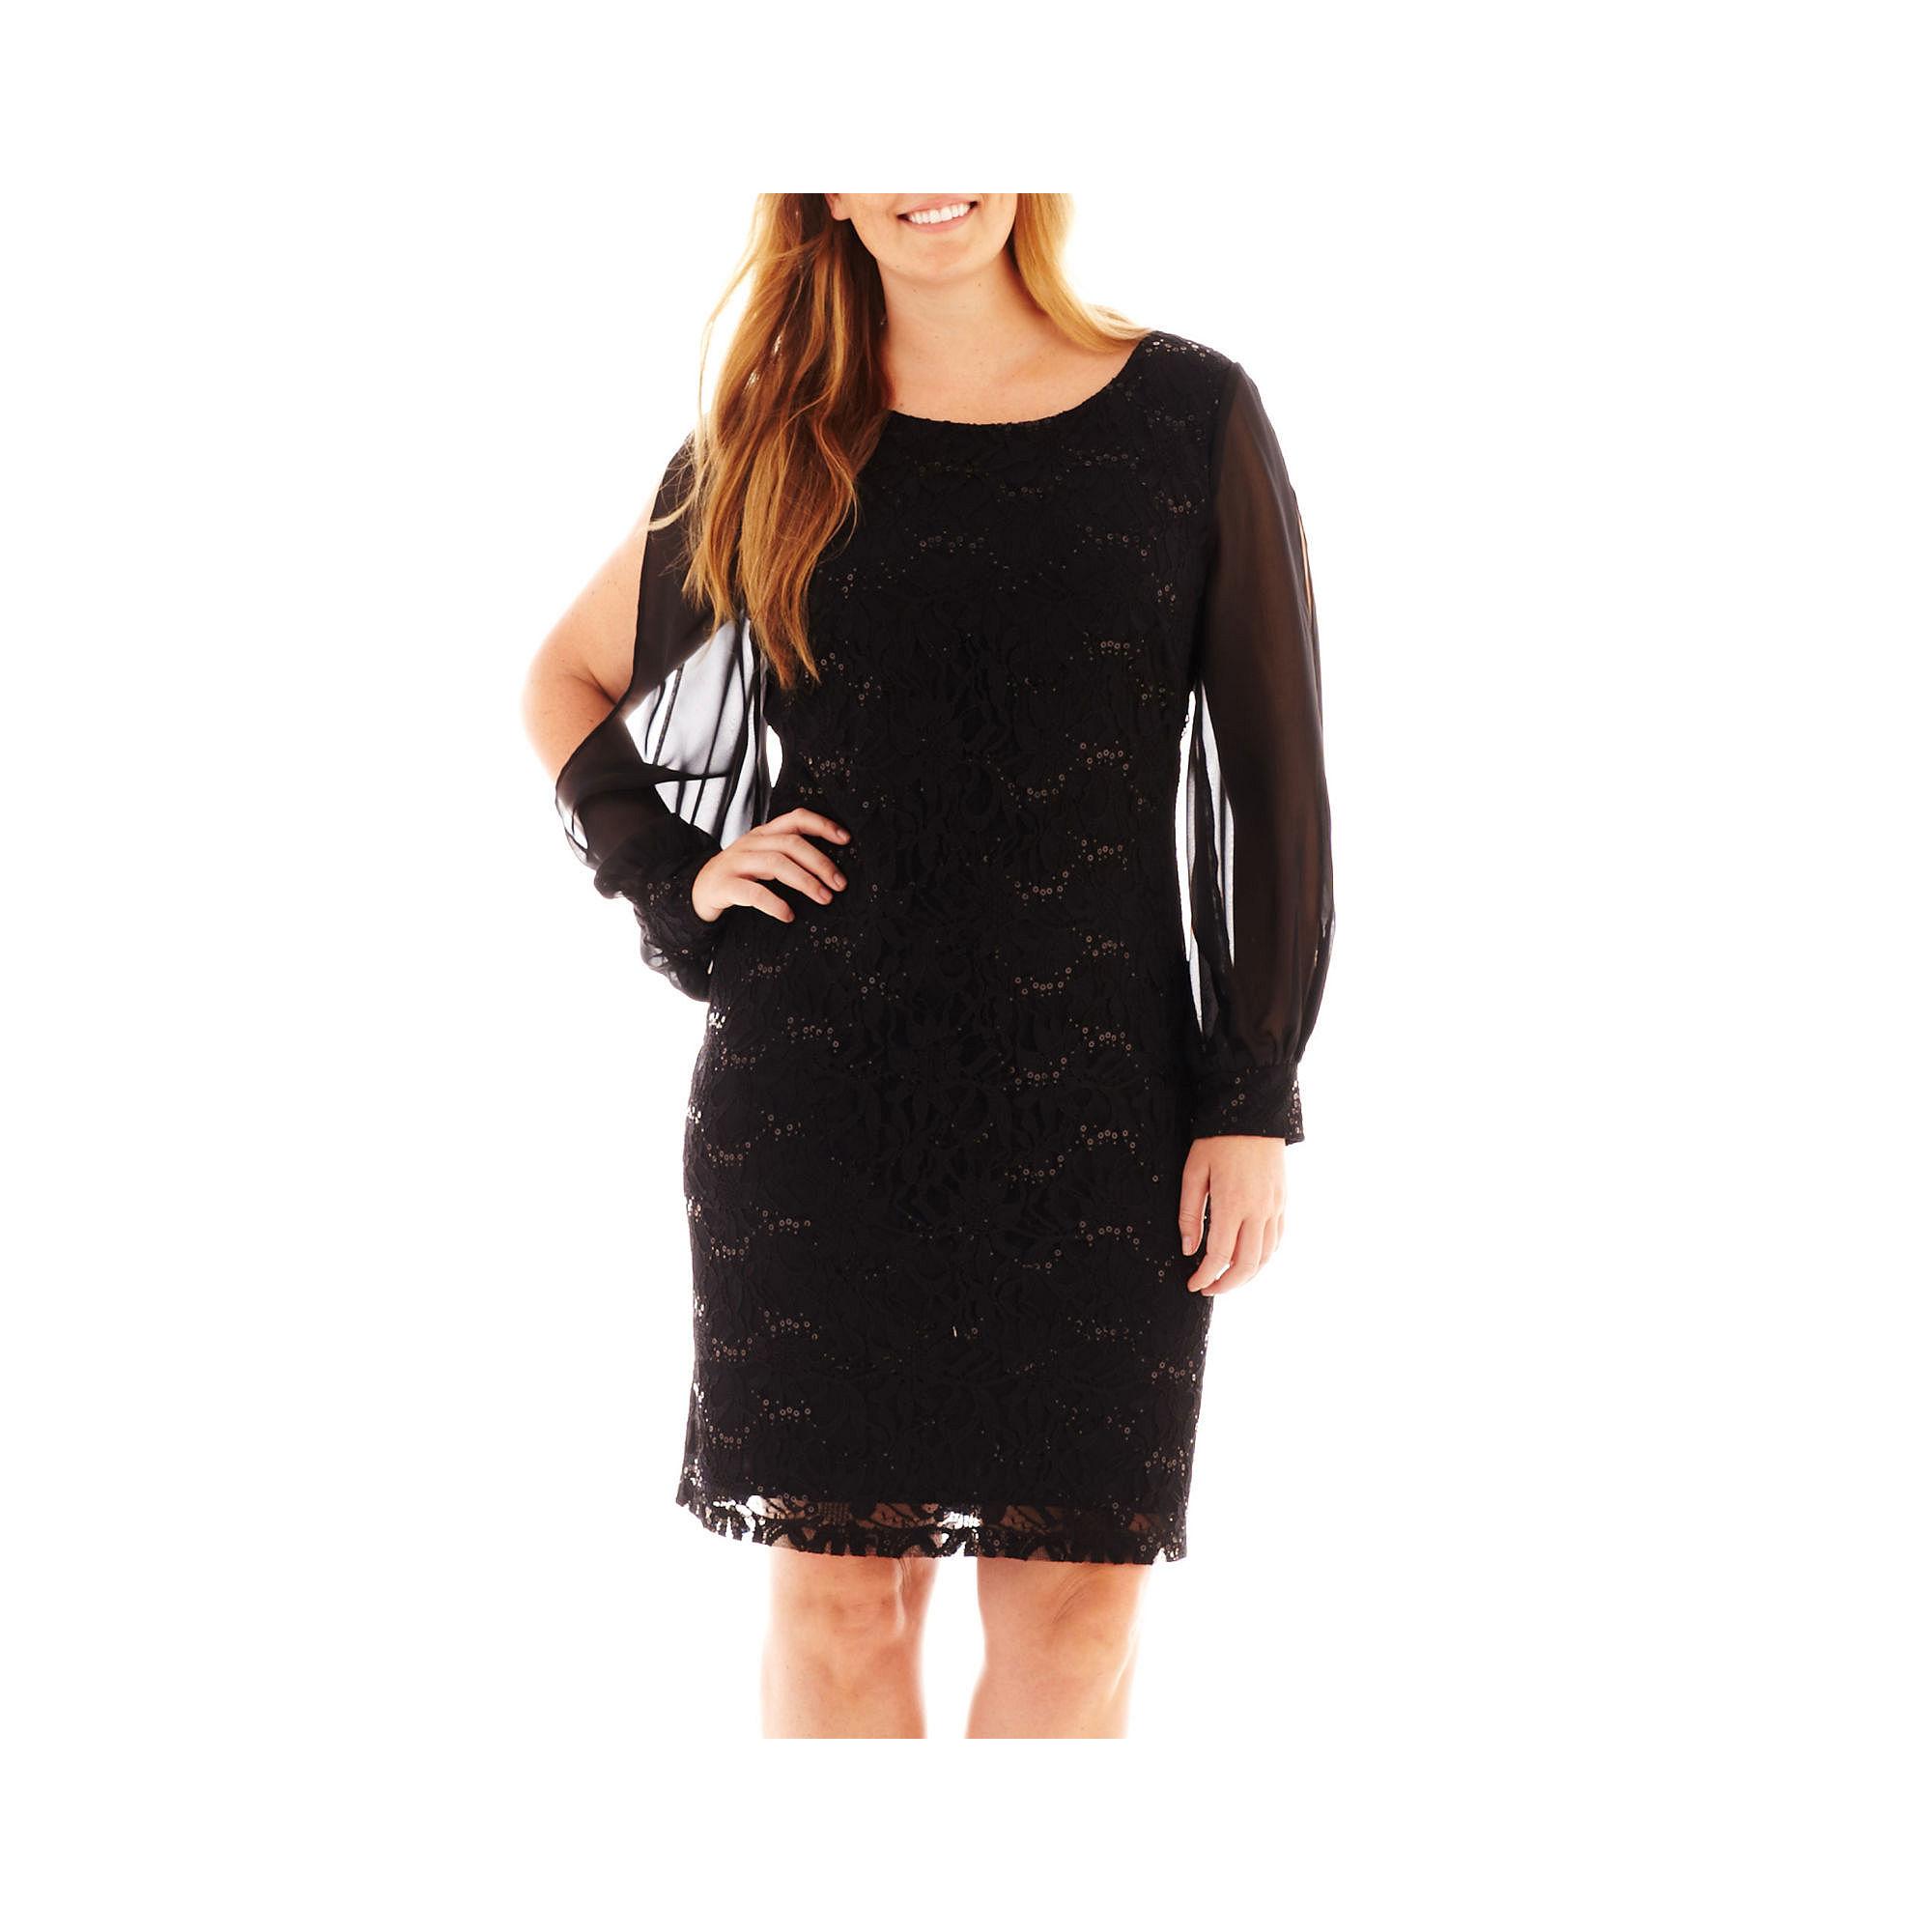 cc9b8ec3 UPC 706990451050 product image for Scarlett Long-Sleeve Lace and Chiffon  Dress - Plus